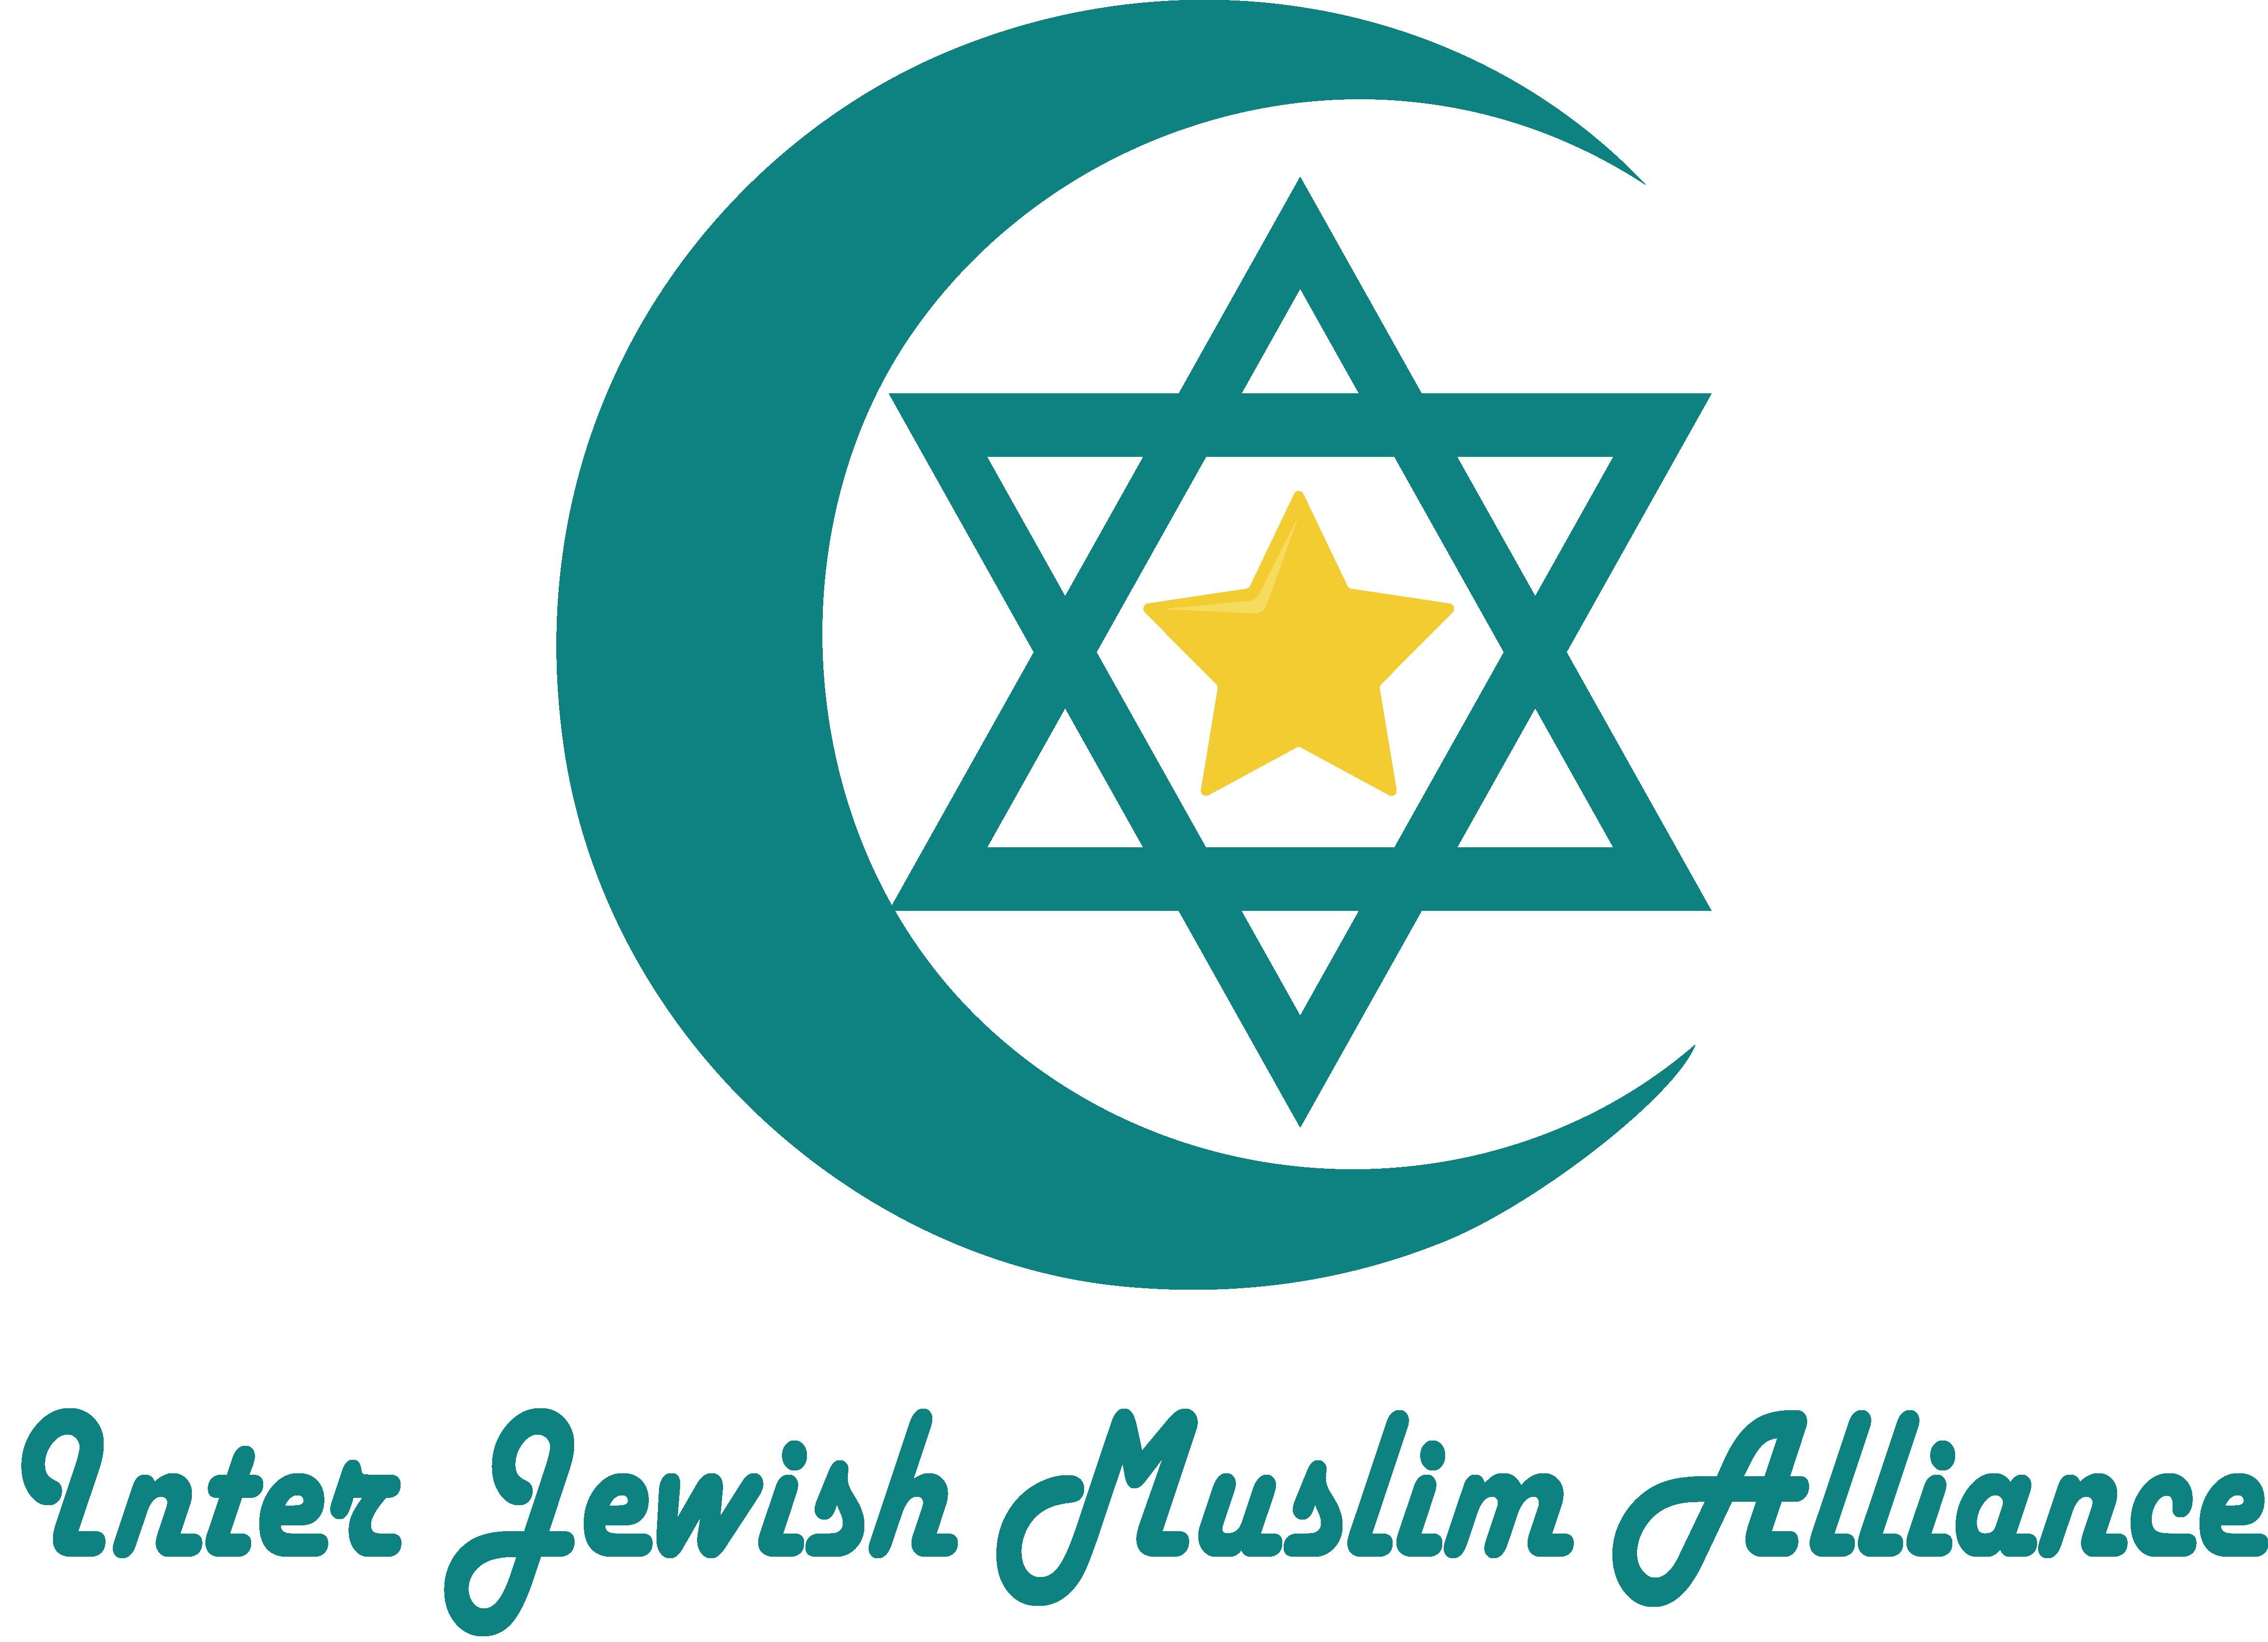 Inter Jewish Muslim Alliance – IJMA